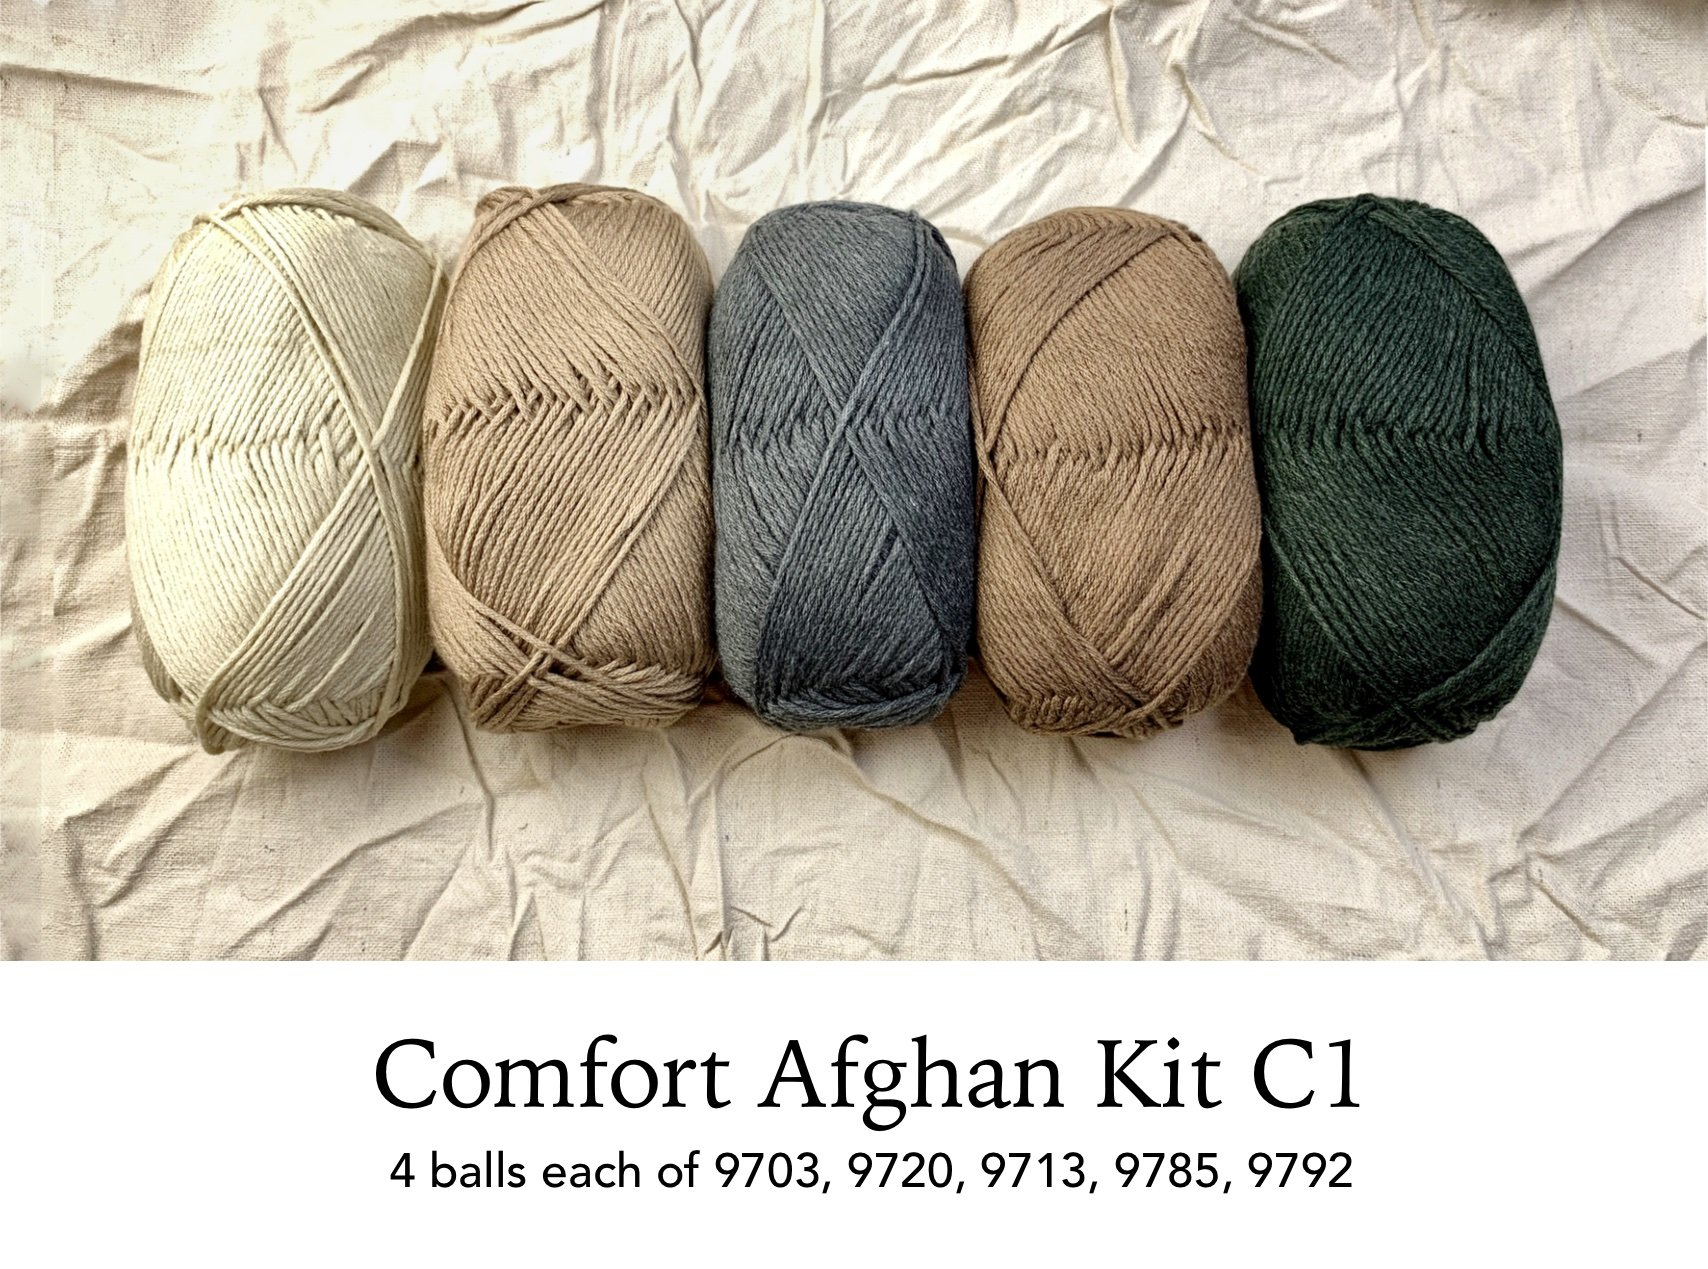 Comfort Afghan by Norah Gaughan (Berroco Drop Ship Program)